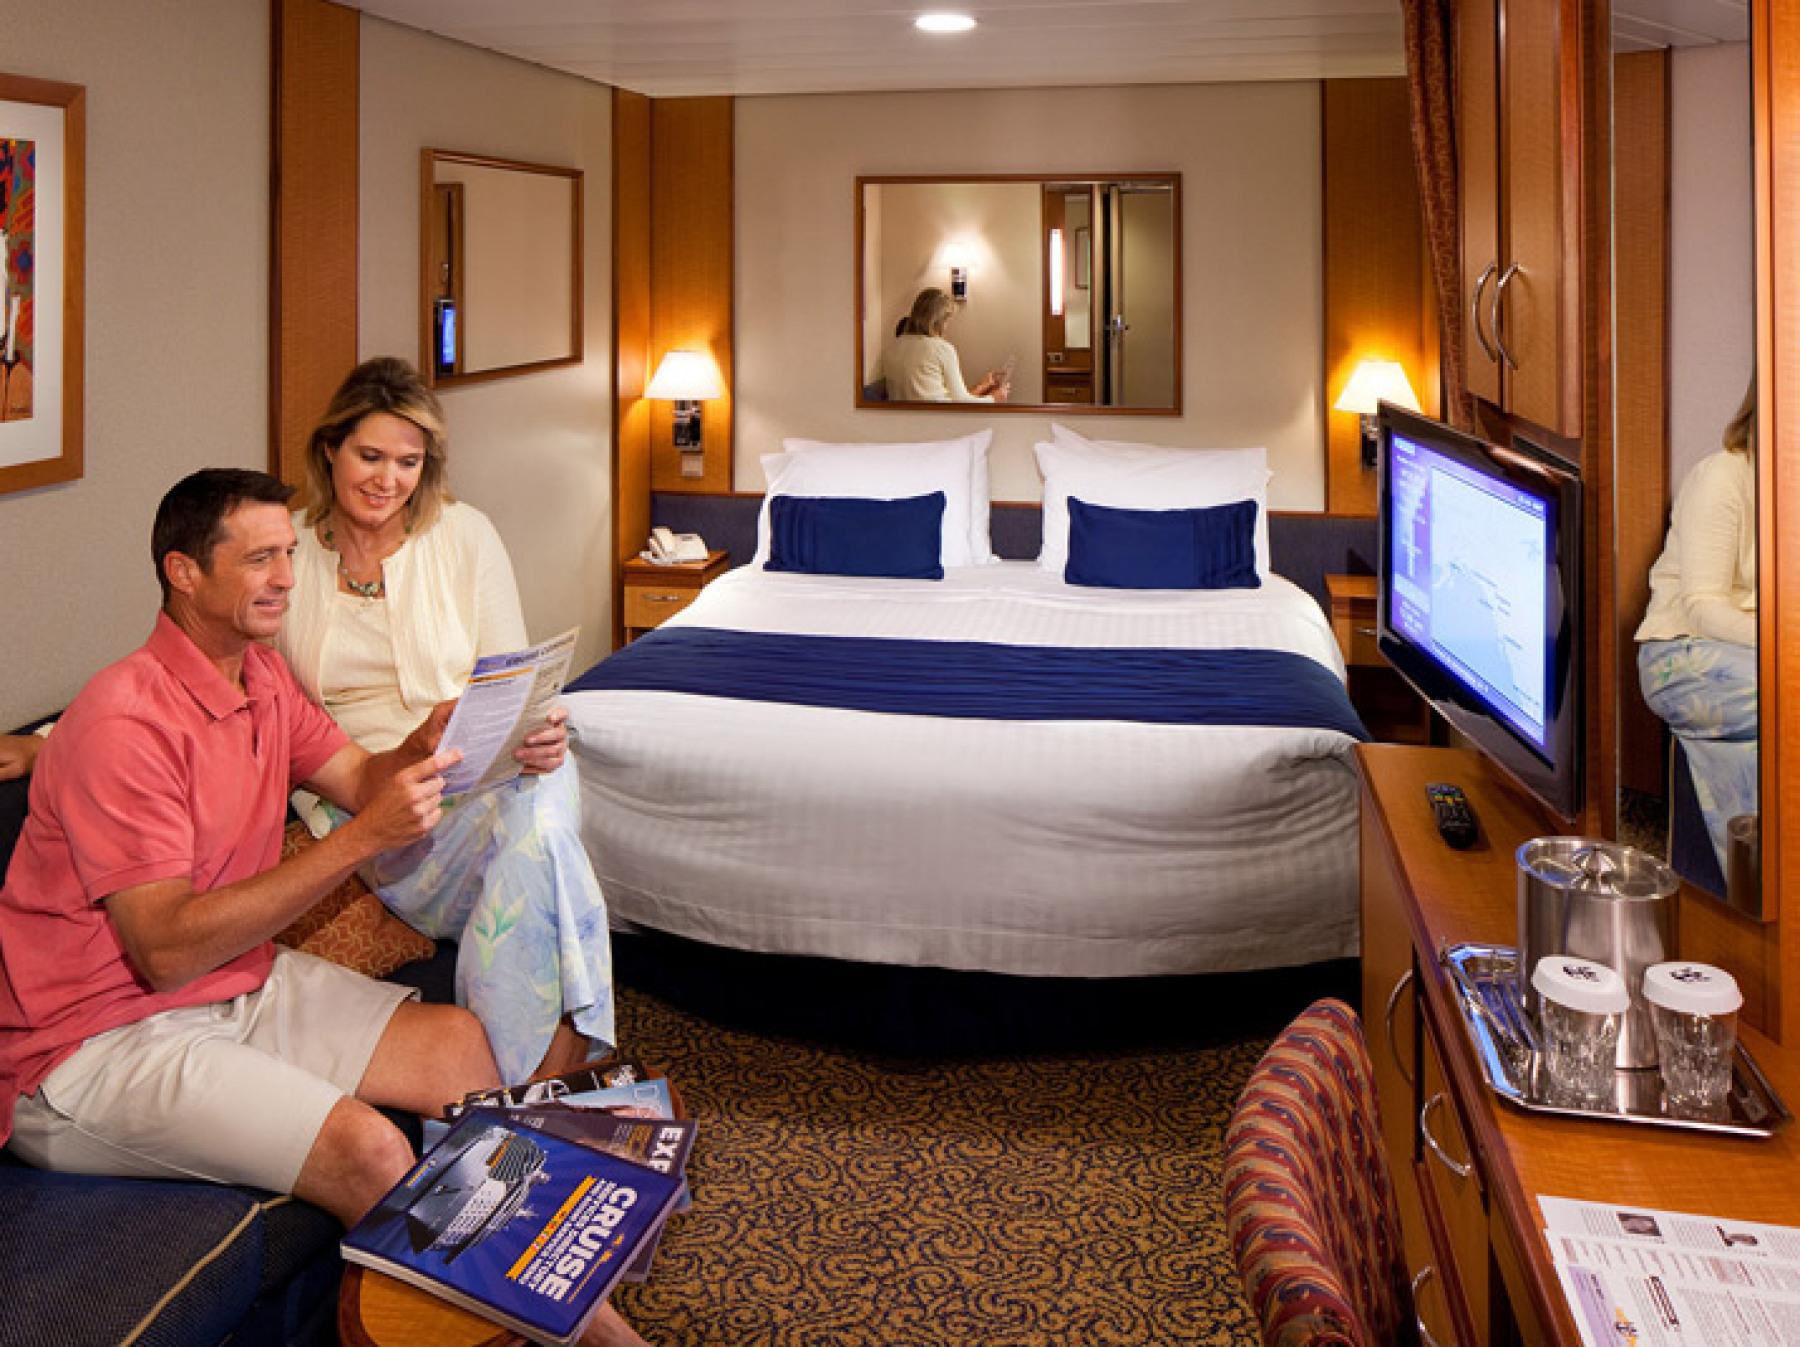 Royal Caribbean International Jewel of the Seas Accommodation Interior stateroom.jpg